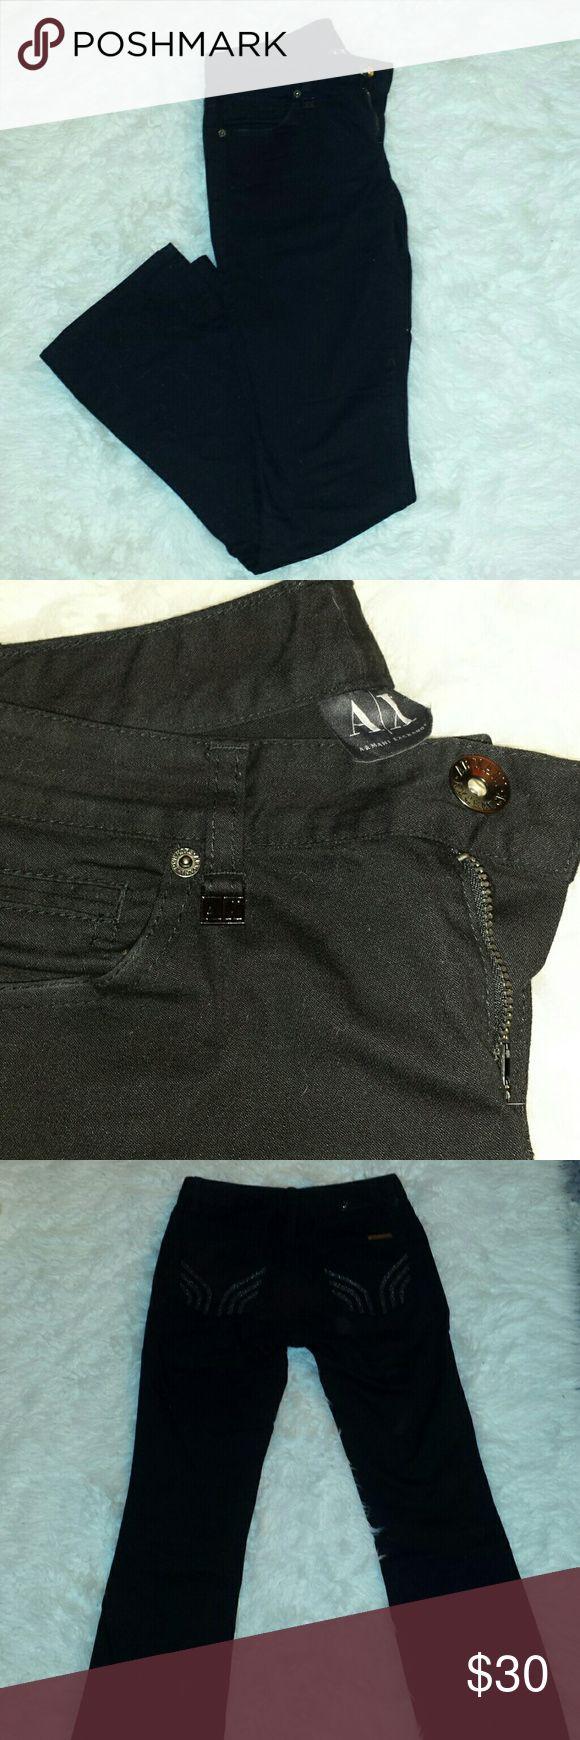 Armani exchange boot cut jeans Armani exchange boot cut jeans, worn few times. Size is 2 regular. Armani Exchange Jeans Boot Cut